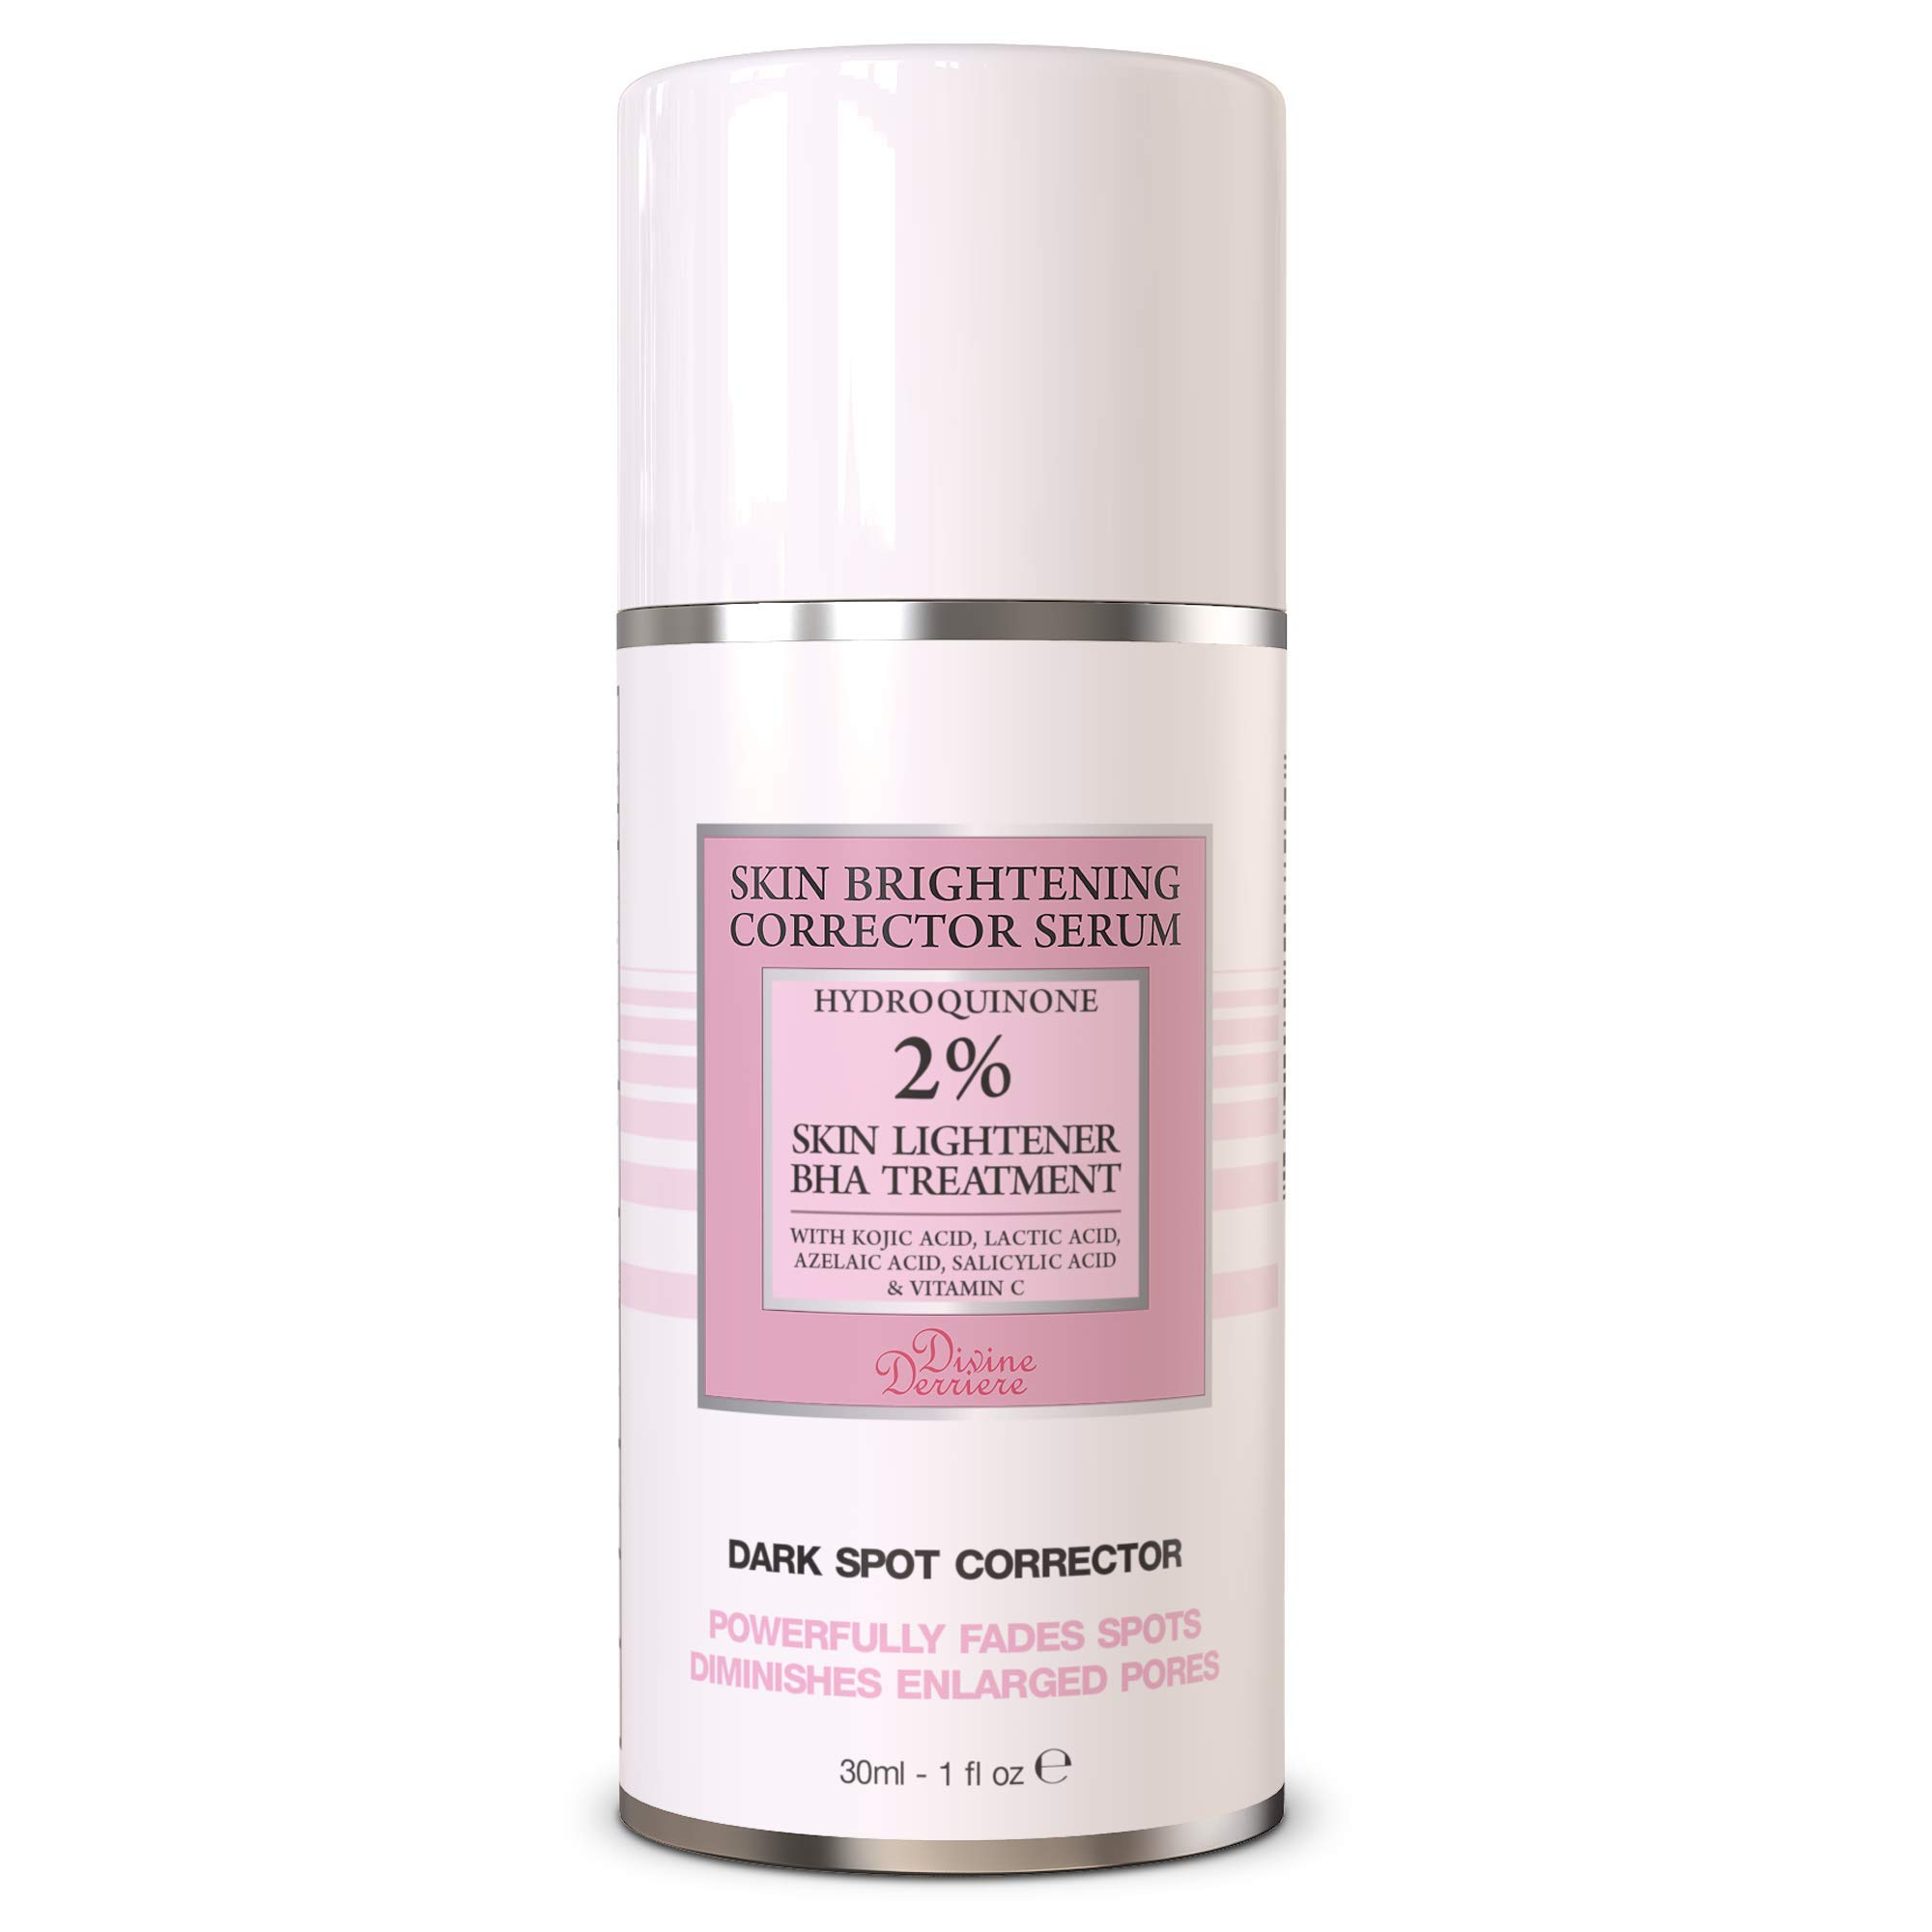 Divine Derriere Dark Spot Corrector Remover for Face Fade Cream with Kojic Acid, Vitamin C, Salicylic Acid, Azelaic Acid, Lactic Acid - Skin Brightening Serum (1oz)